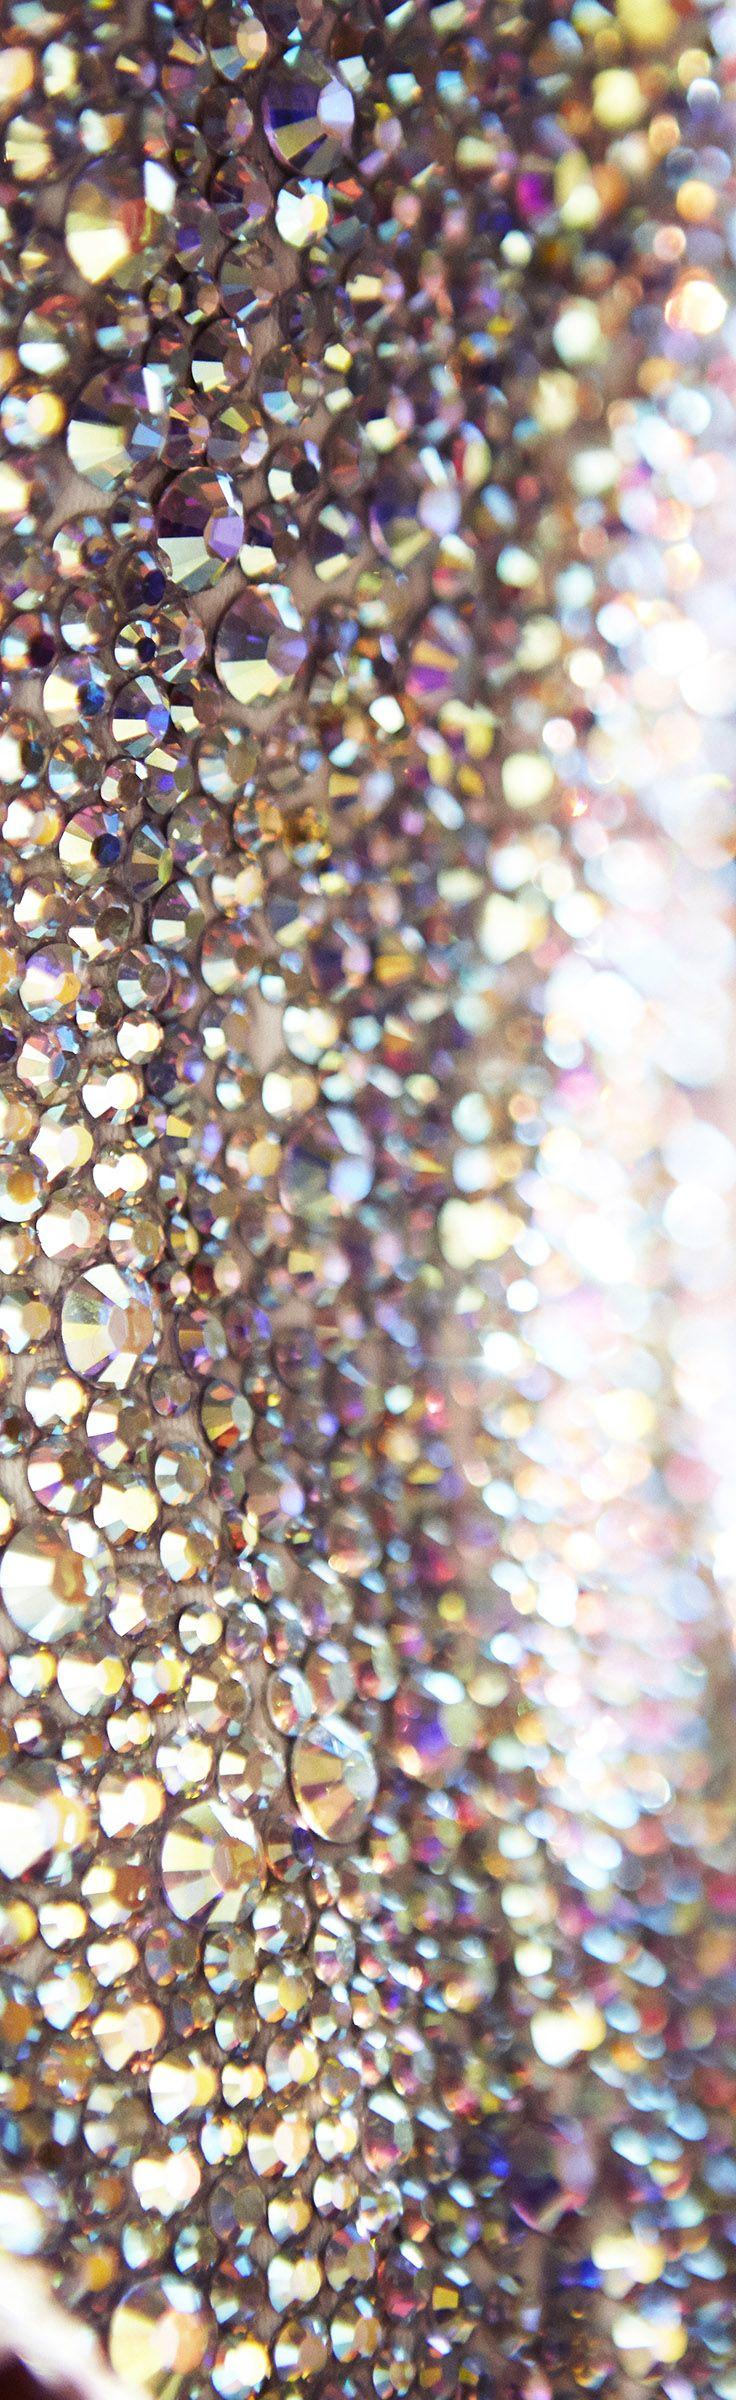 swarovski crystal wallpaper million collection 15